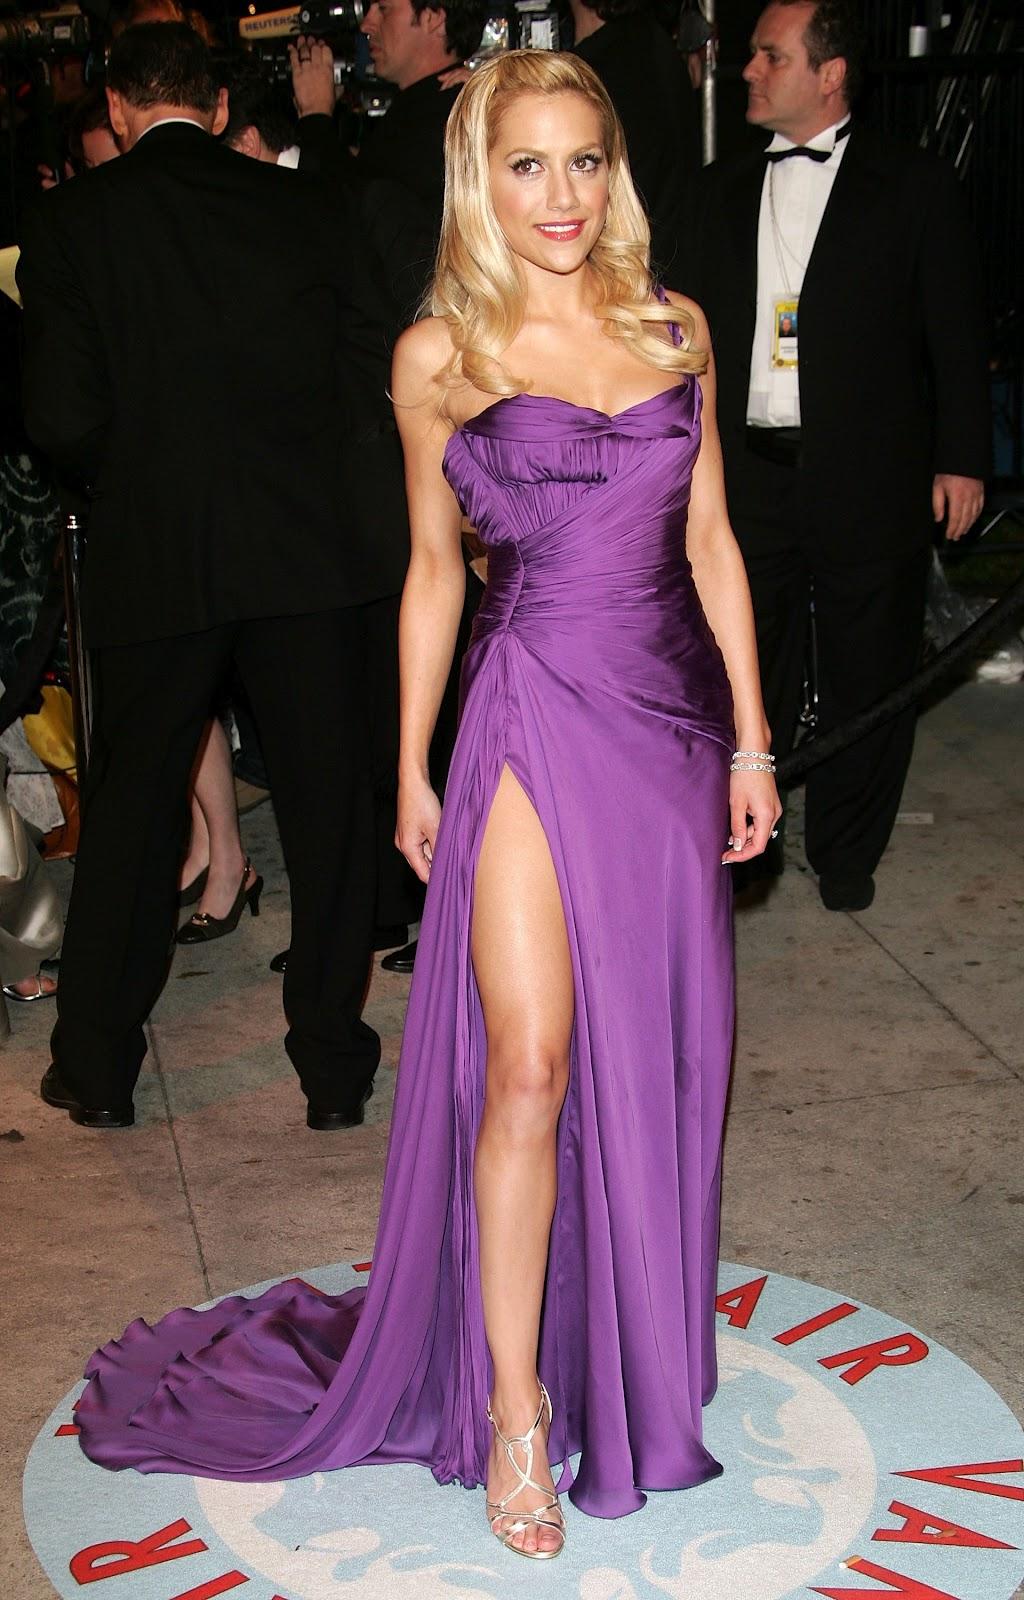 http://4.bp.blogspot.com/-_IeoihGCIO0/T6KFchTViCI/AAAAAAAAQuI/t4YUKkqr8Z4/s1600/64520_Brittany_Murphy_Vanity_Fair_Oscar_Party_05.jpg